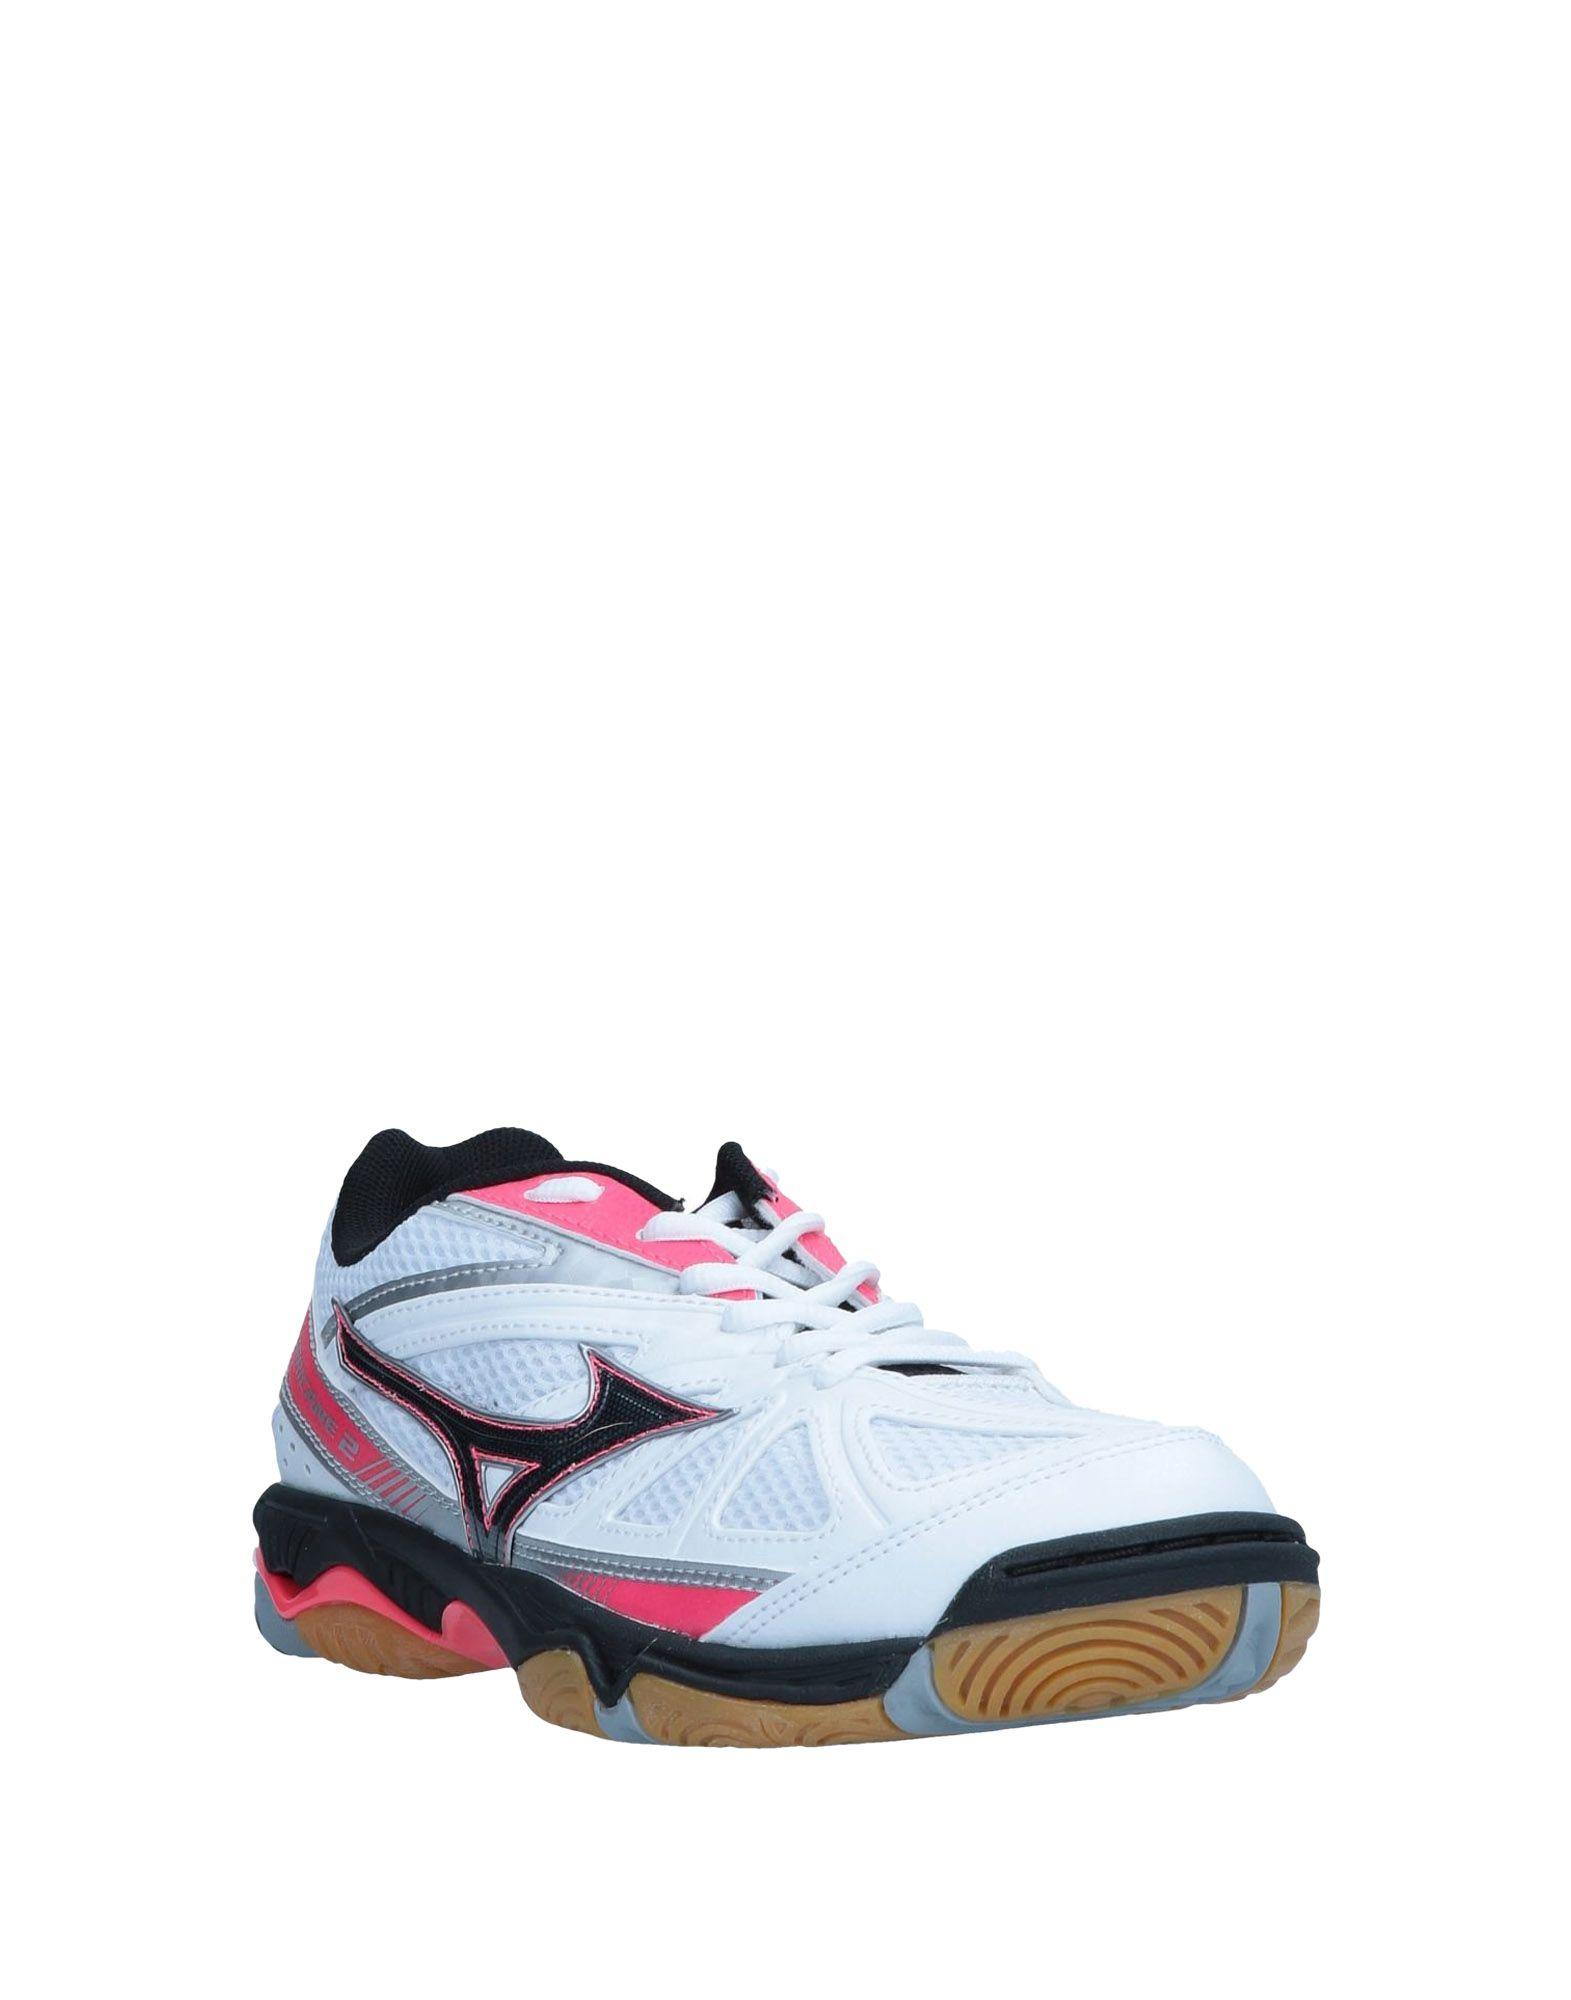 Mizuno Sneakers - - - Women Mizuno Sneakers online on  United Kingdom - 11546168DJ 78eaa4